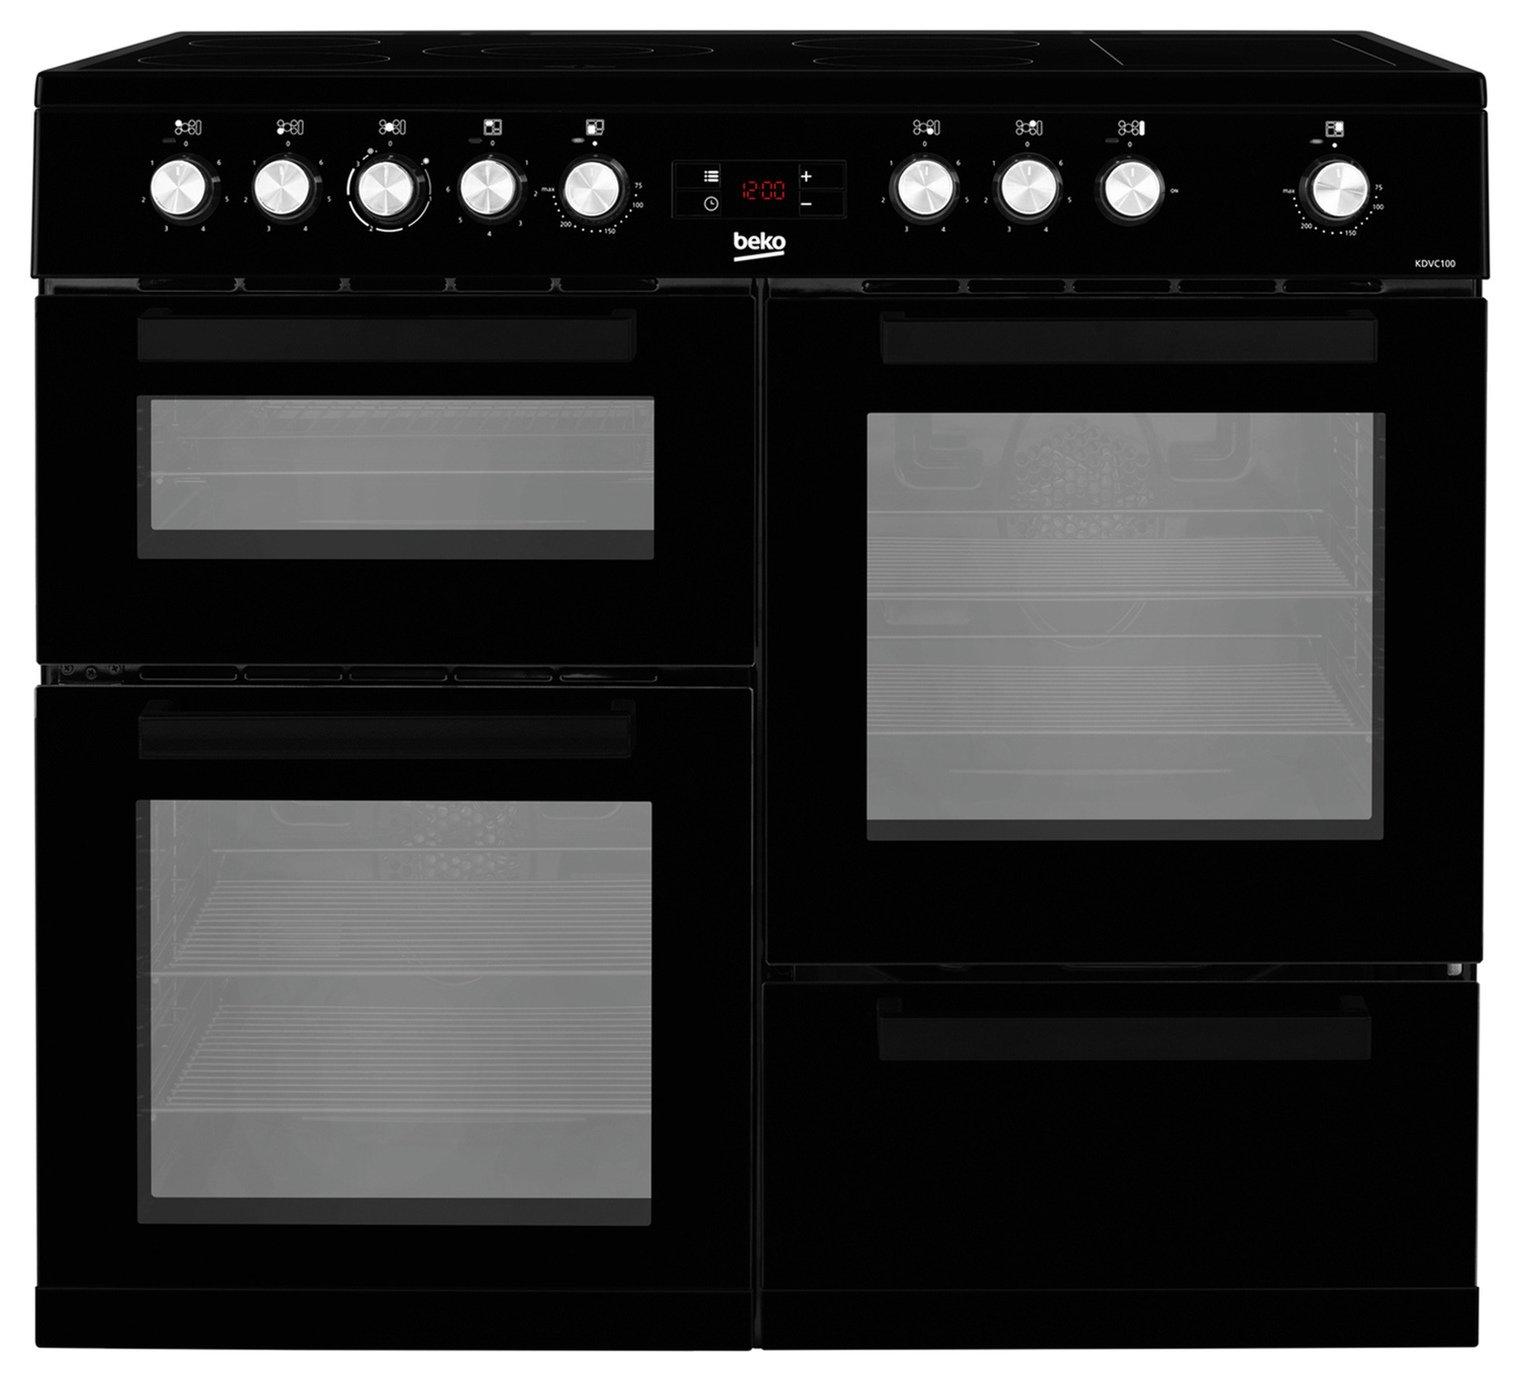 Beko KDVC100K 100cm Electric Range Cooker - Black